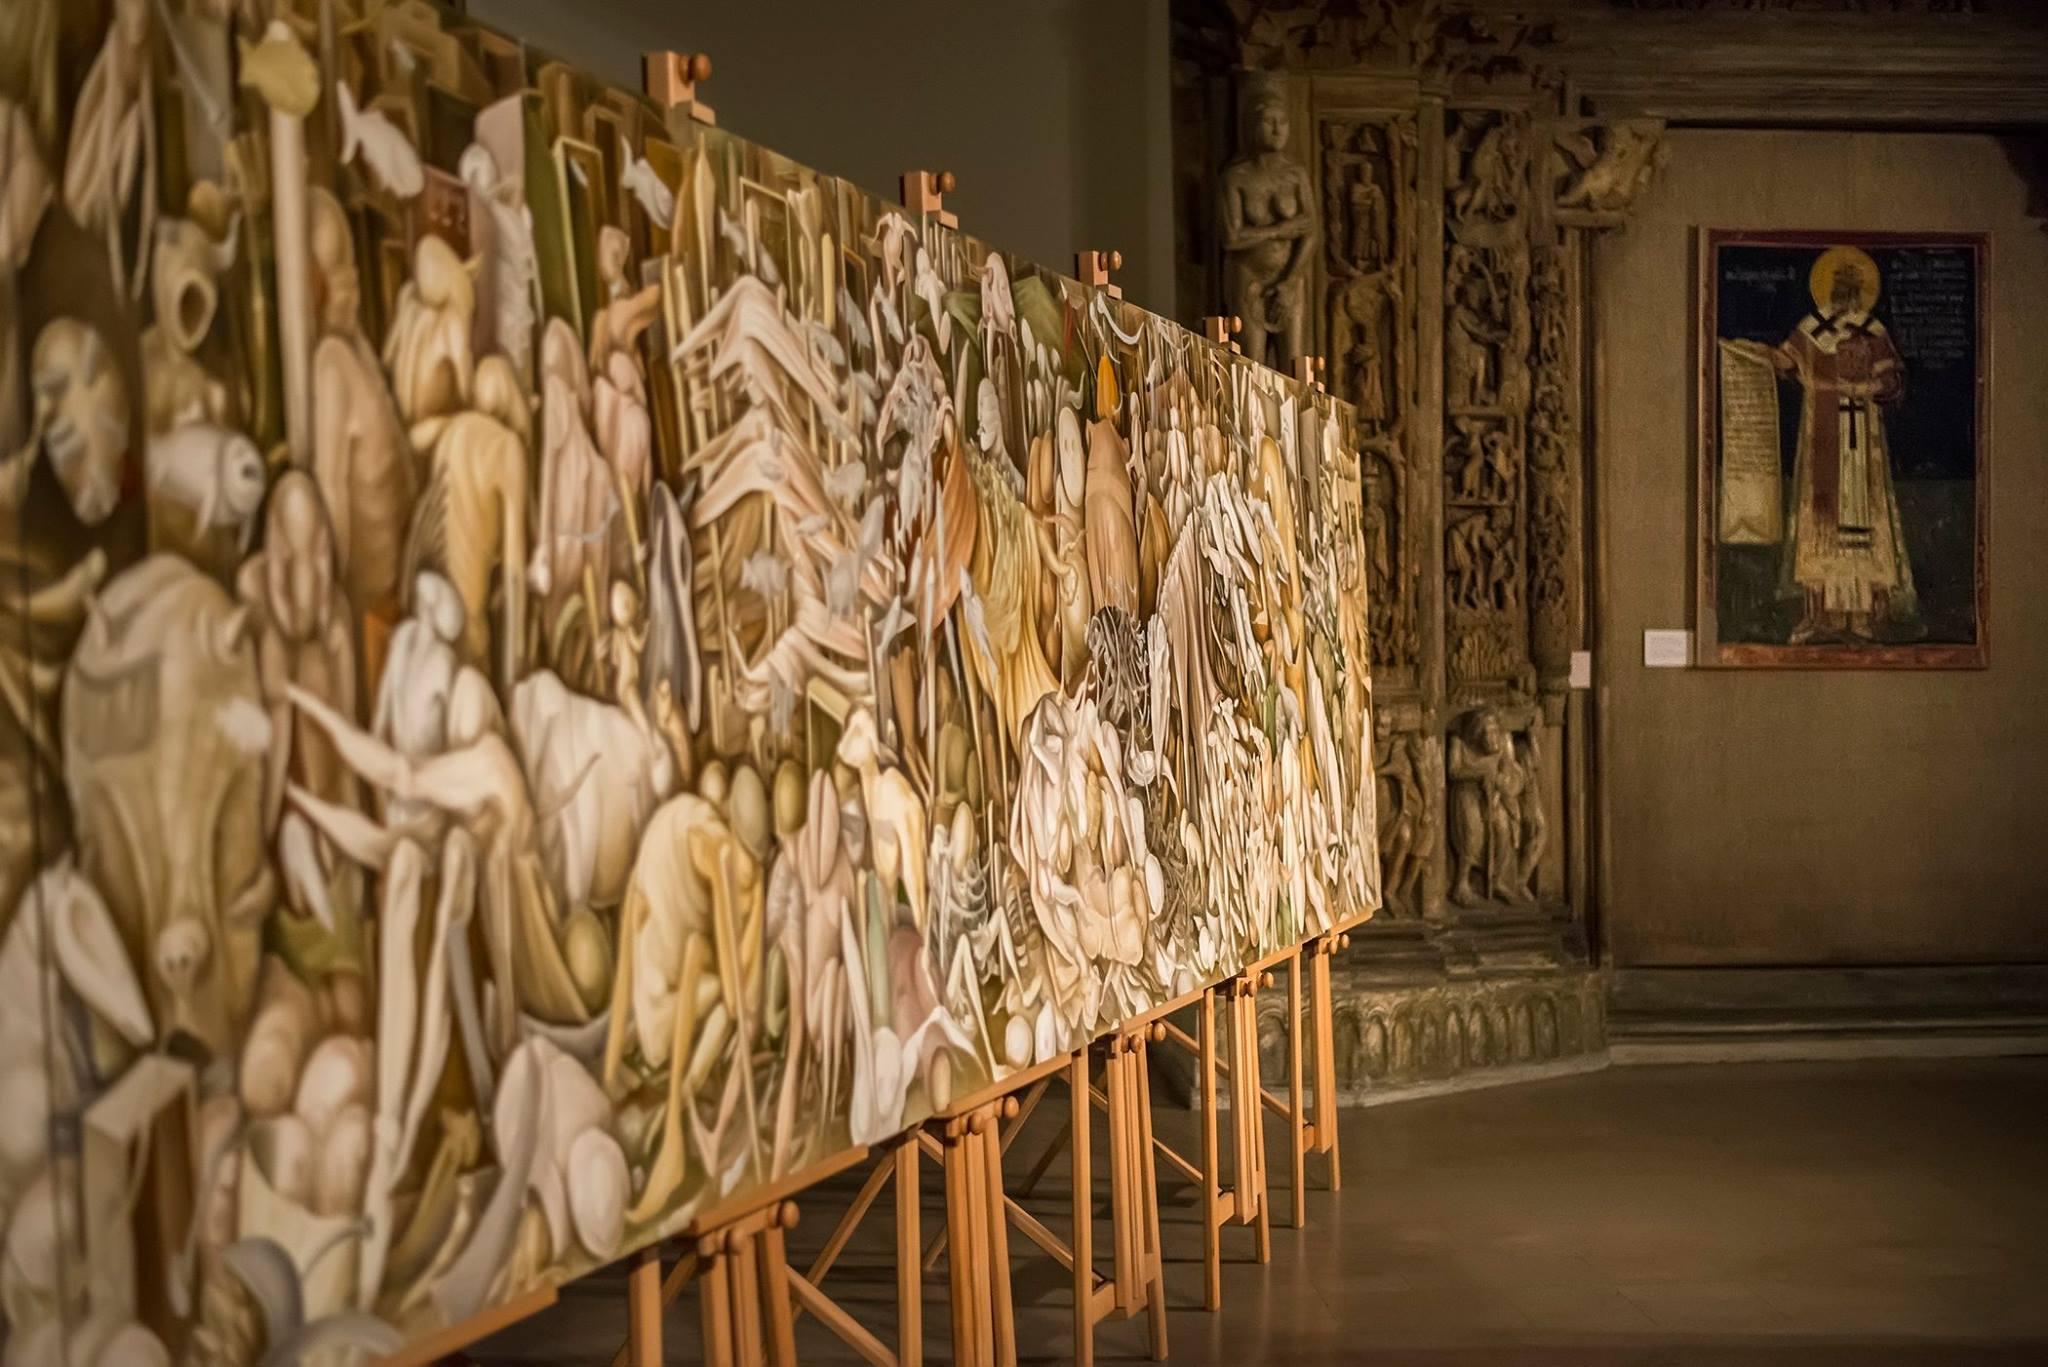 'Purgatorium' - Gallery of Frescoes, National Museum of Serbia, November 5th, 2015 — in Belgrade, Serbia.